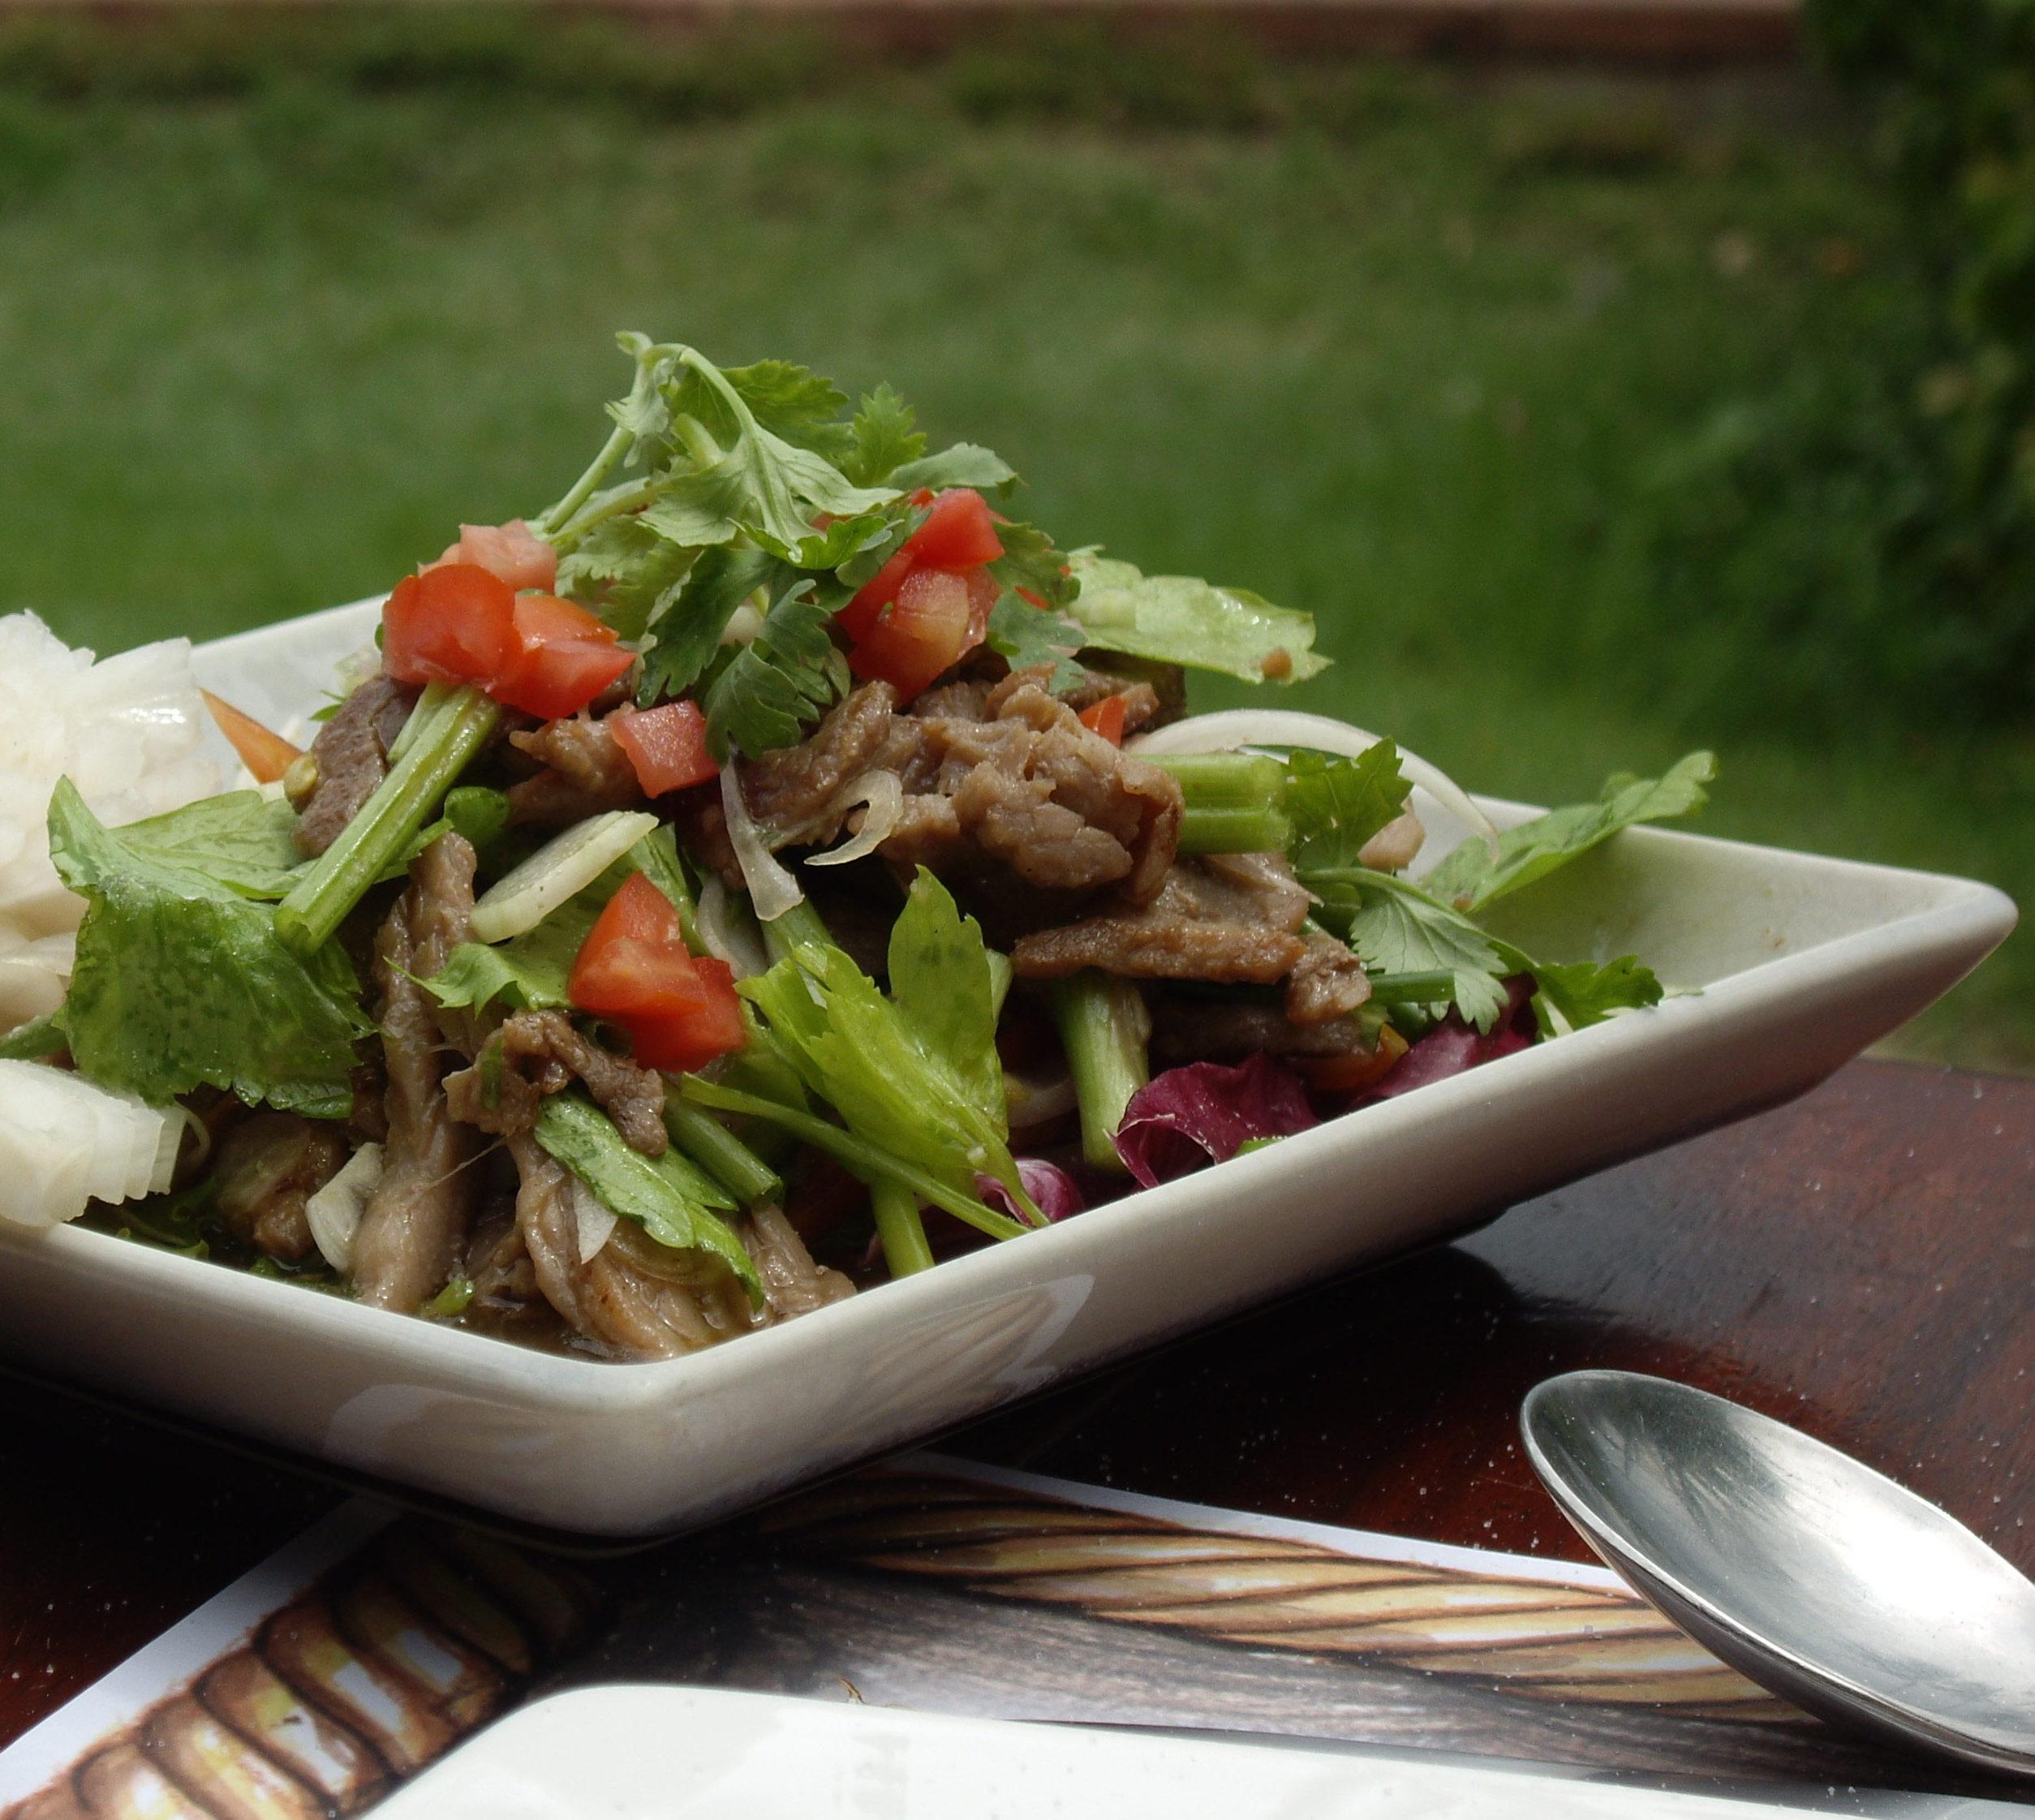 spicy oksek ds salat yam neua opskrift lav thai mad. Black Bedroom Furniture Sets. Home Design Ideas